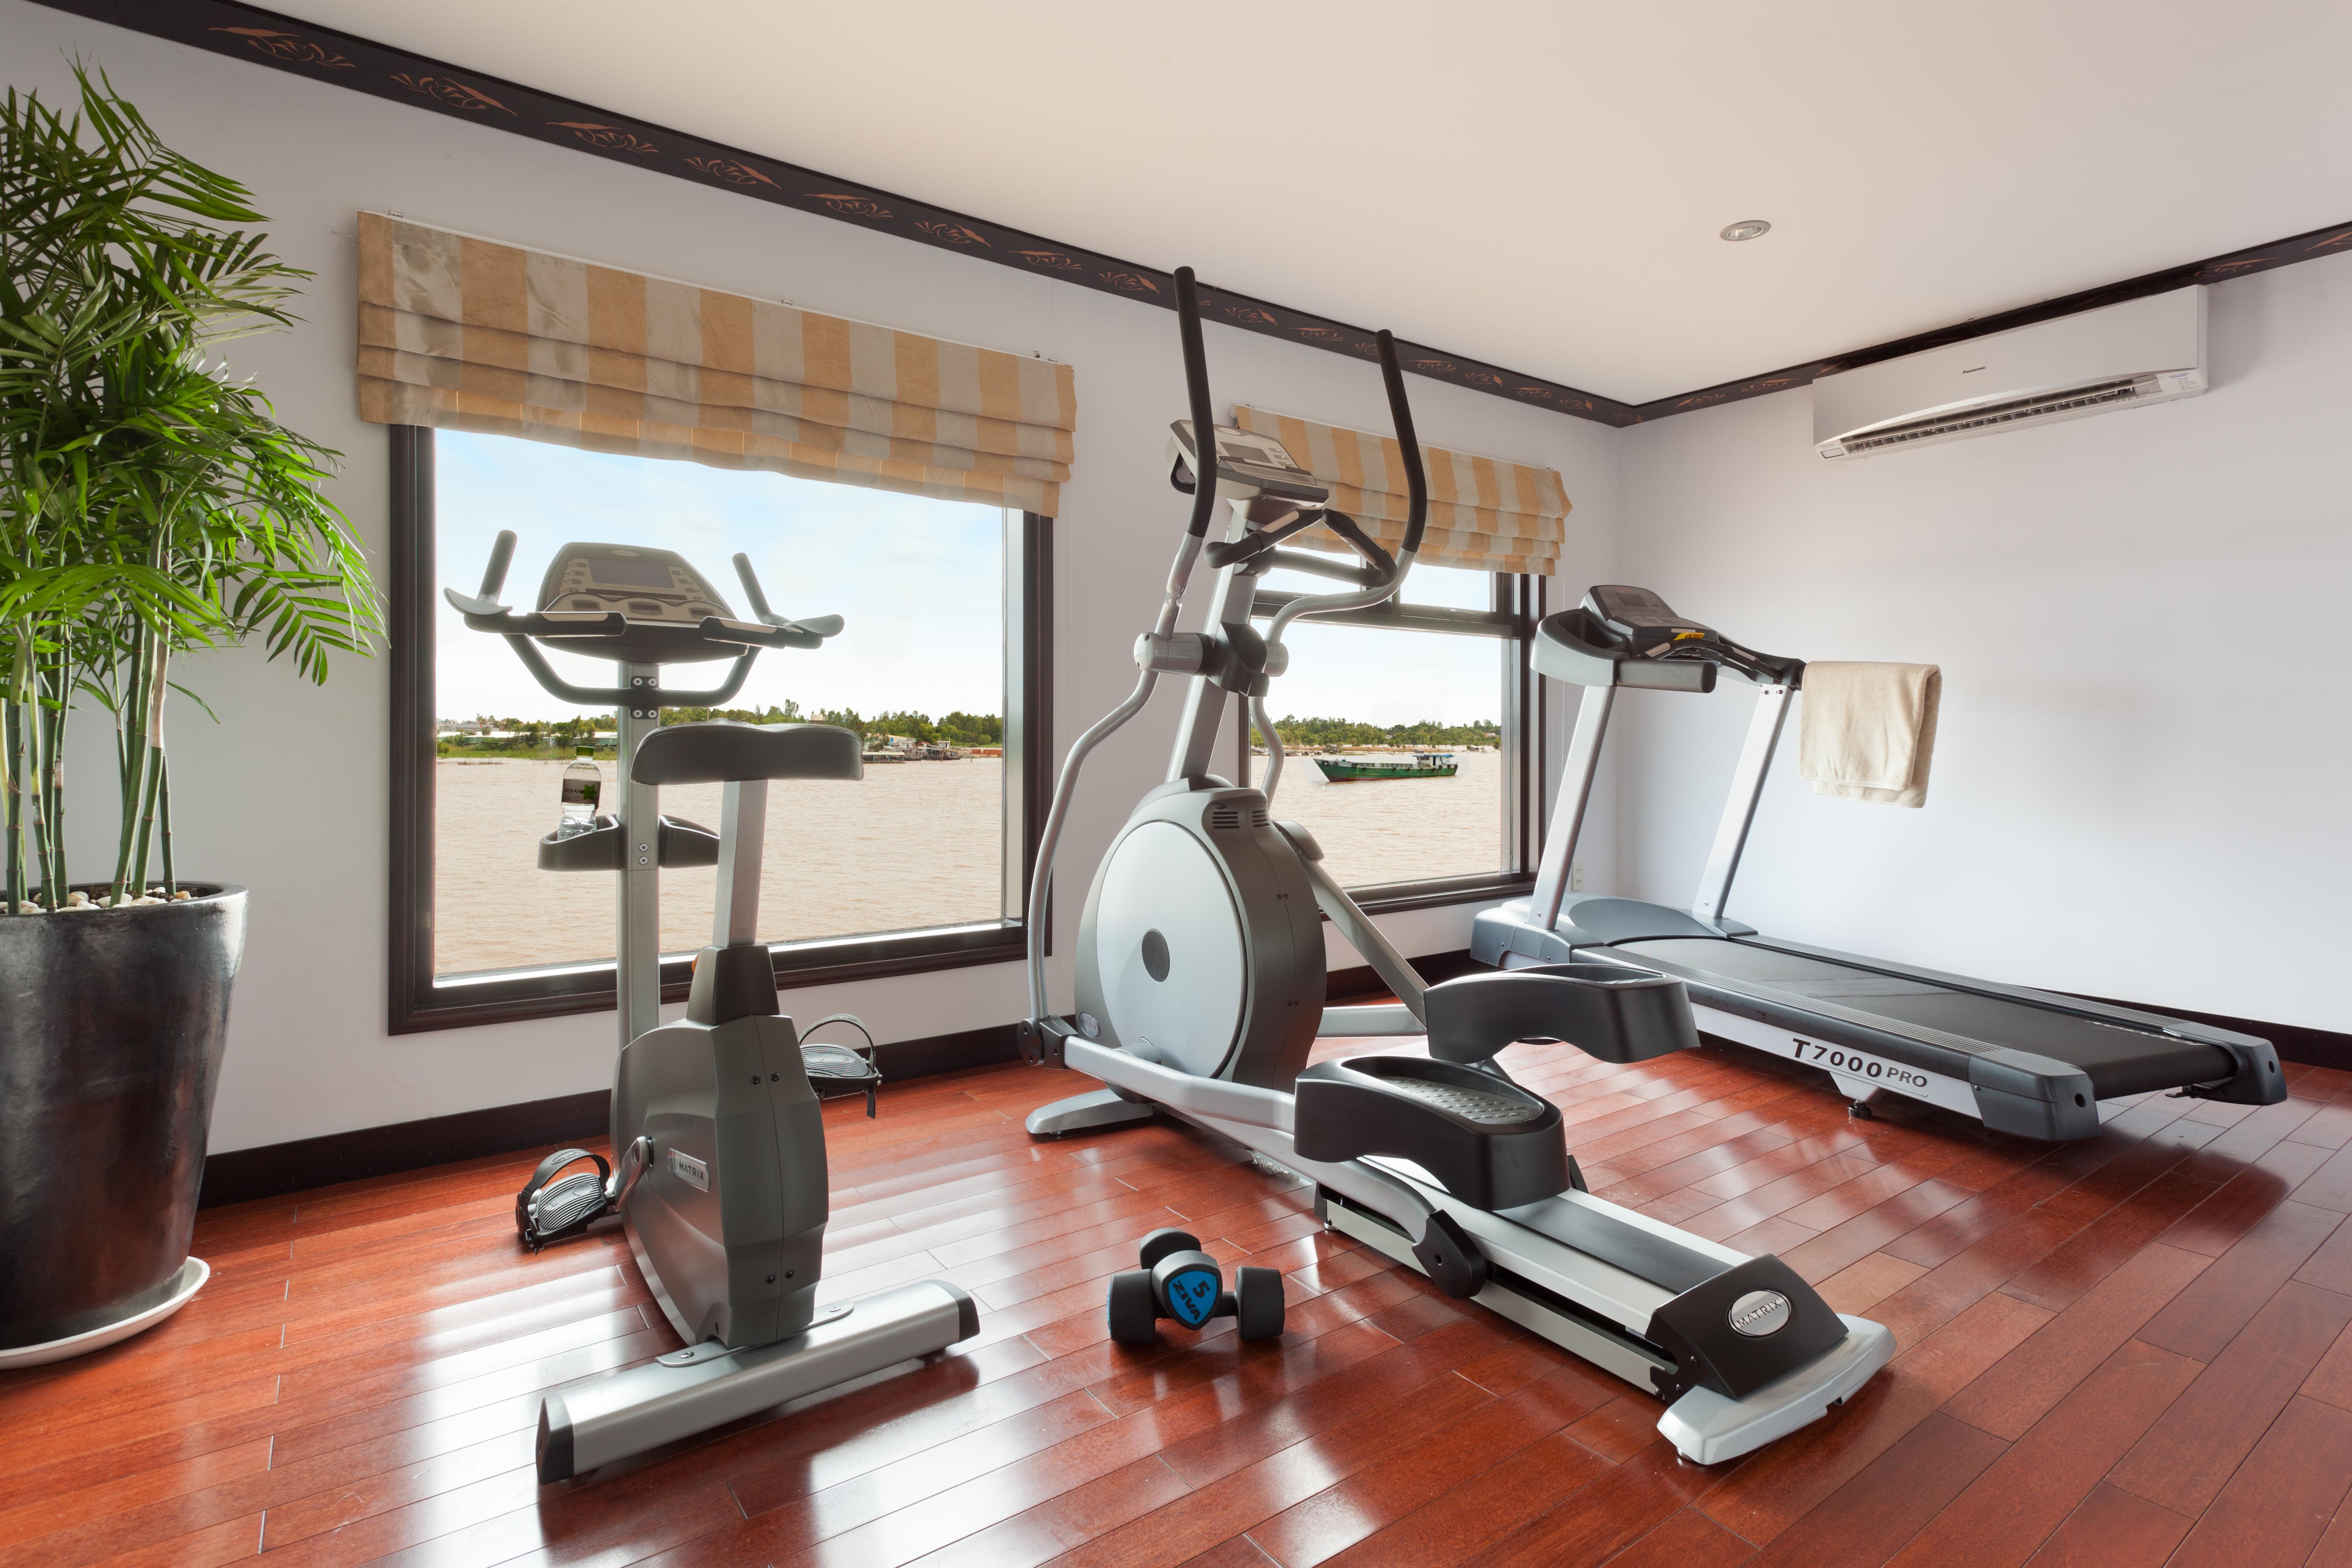 AmaWaterways AmaLotus Interior Fitness Center.jpg